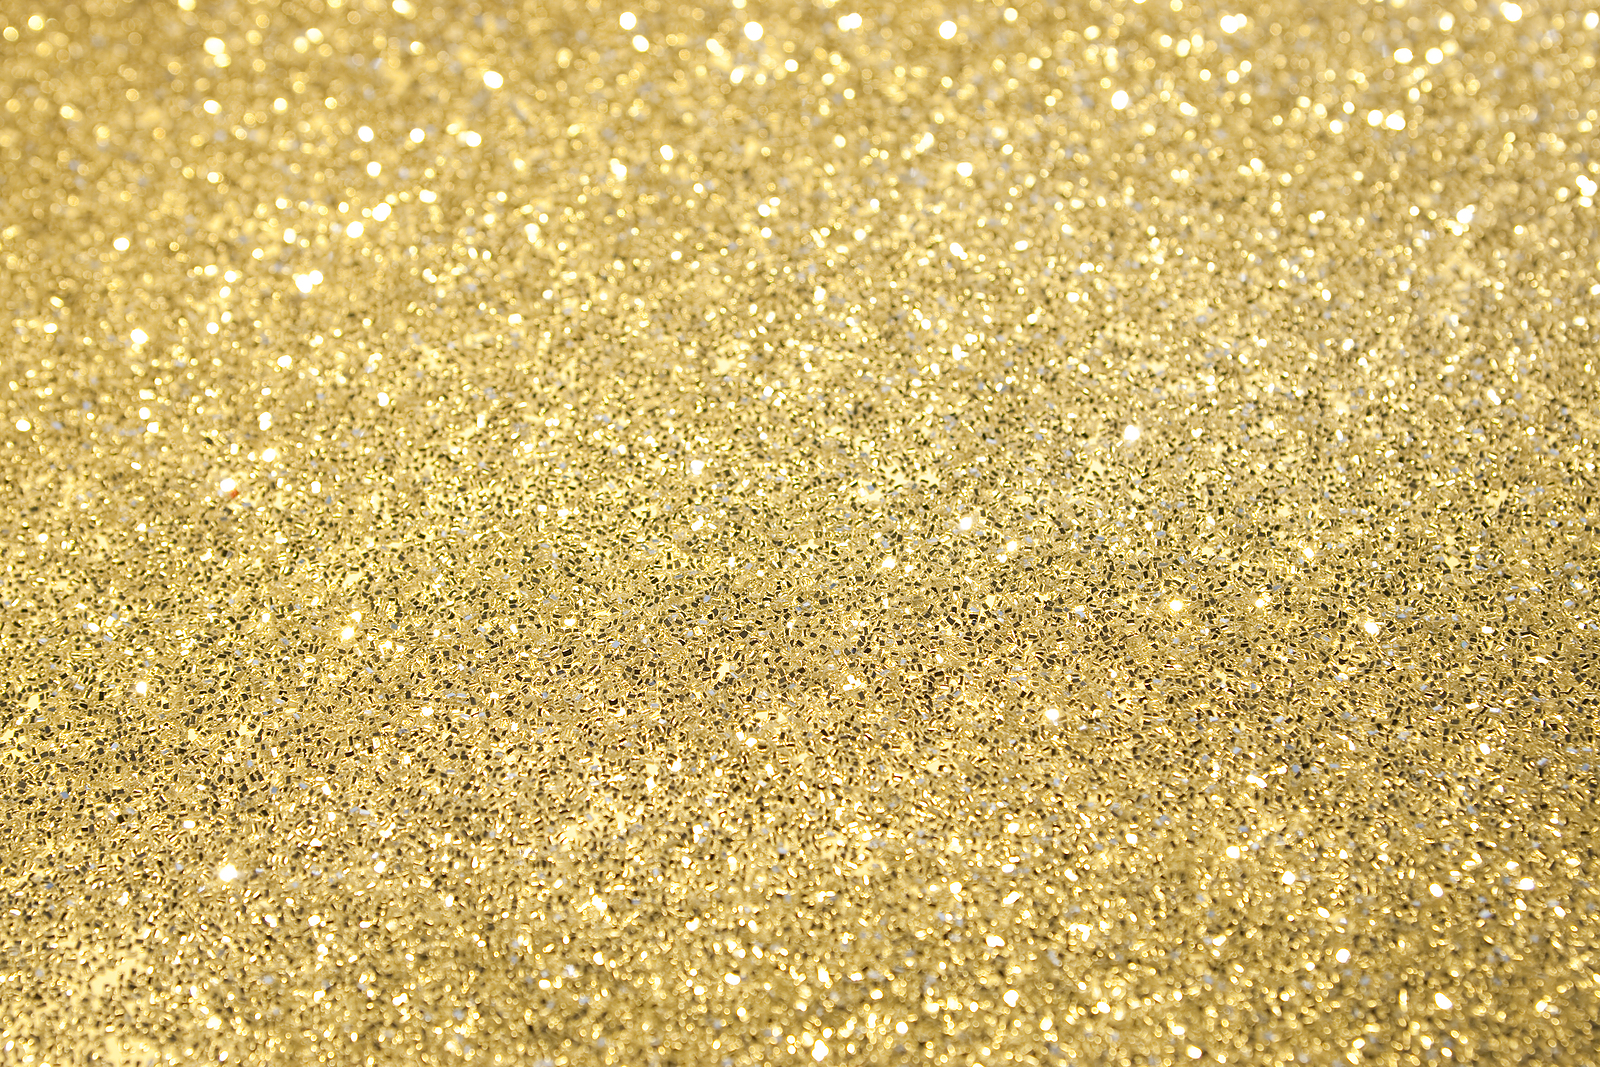 gold glitter background wallpaper wallpapersafari. Black Bedroom Furniture Sets. Home Design Ideas